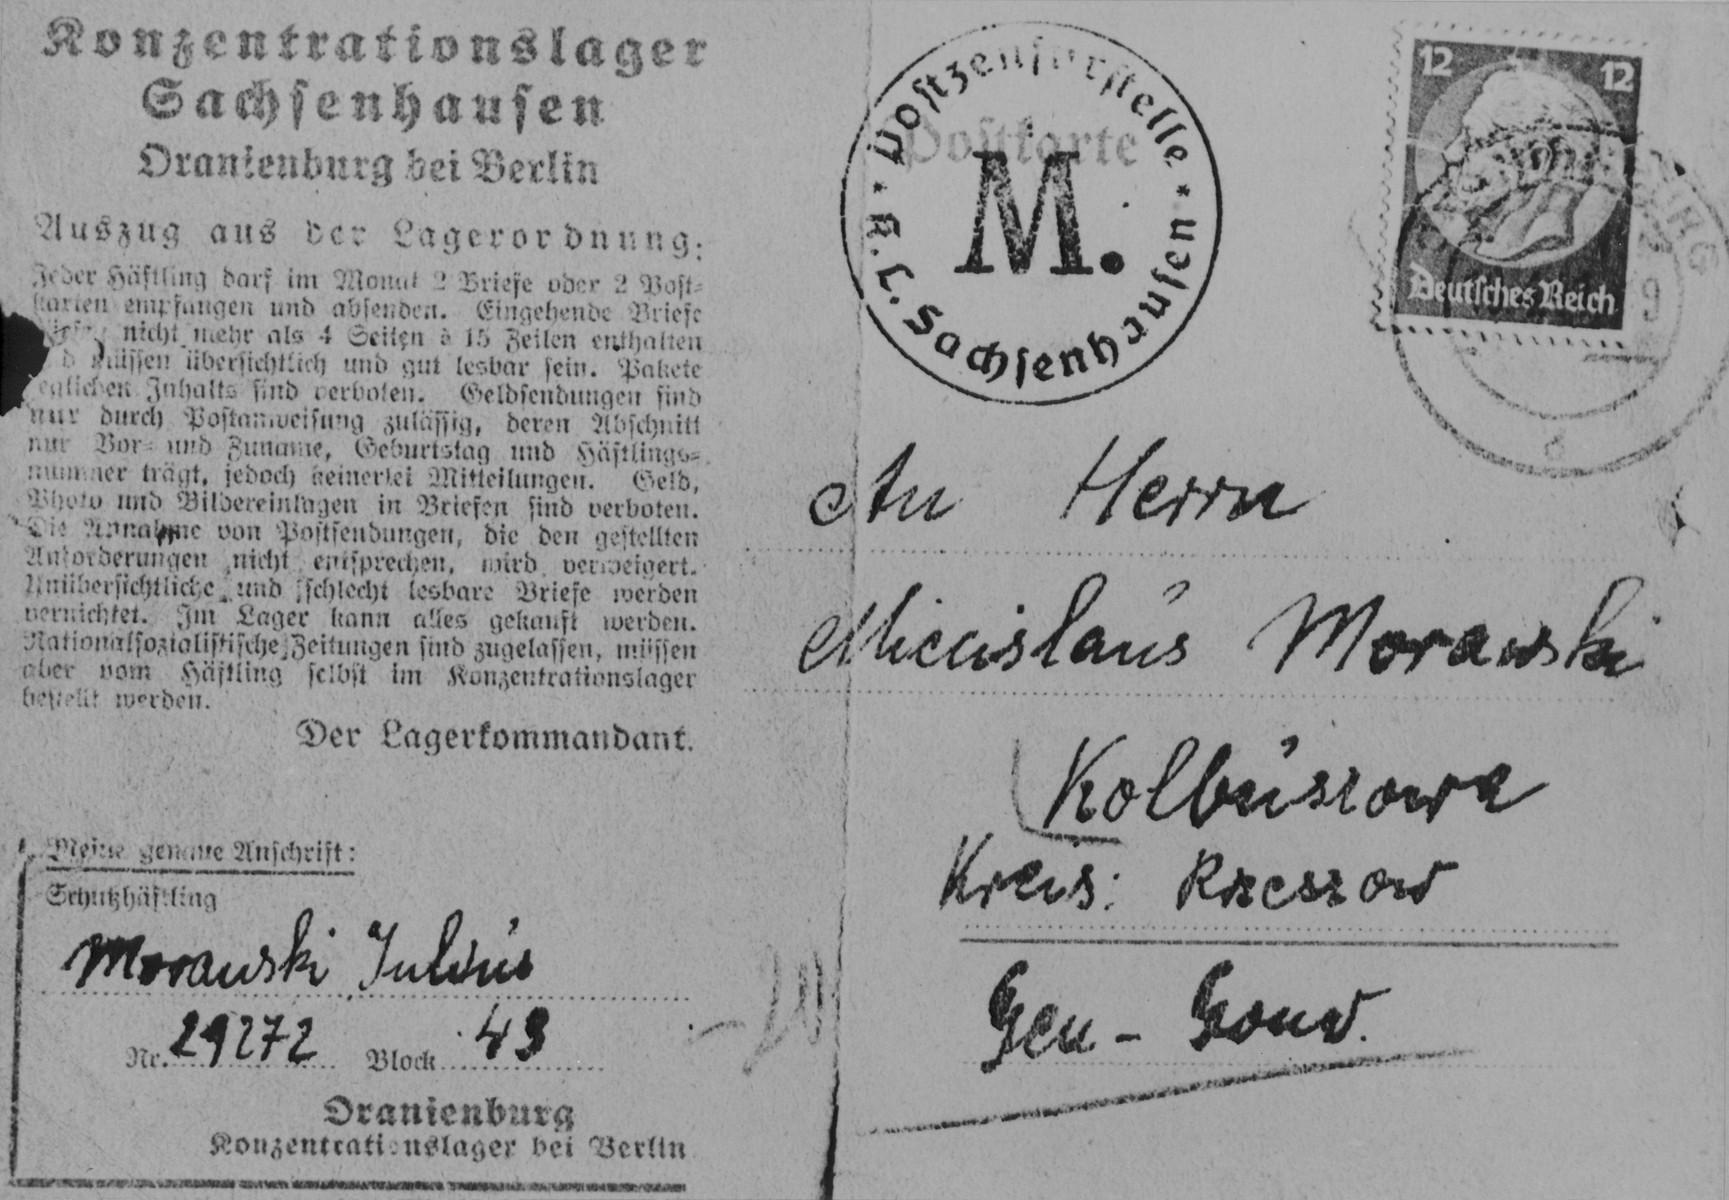 A postcard sent from Julius Morawski in Oranienburg to Miecislaus Morawski in Kolbuszowa.